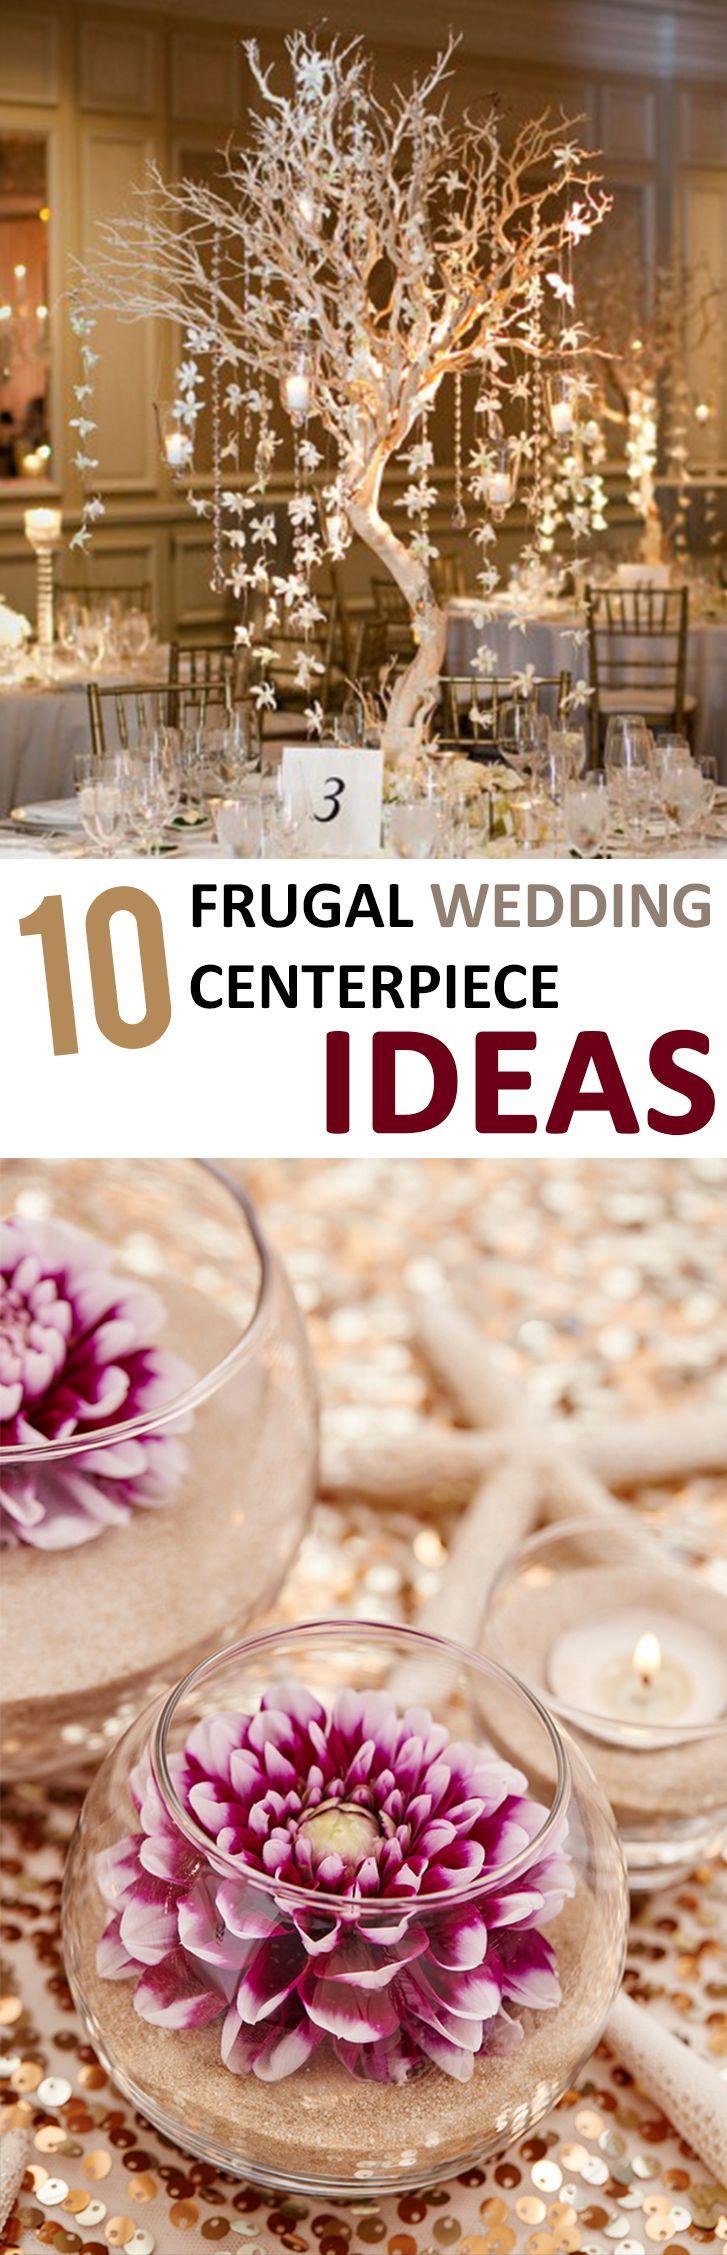 10 Frugal Wedding Centerpiece Ideas Diy